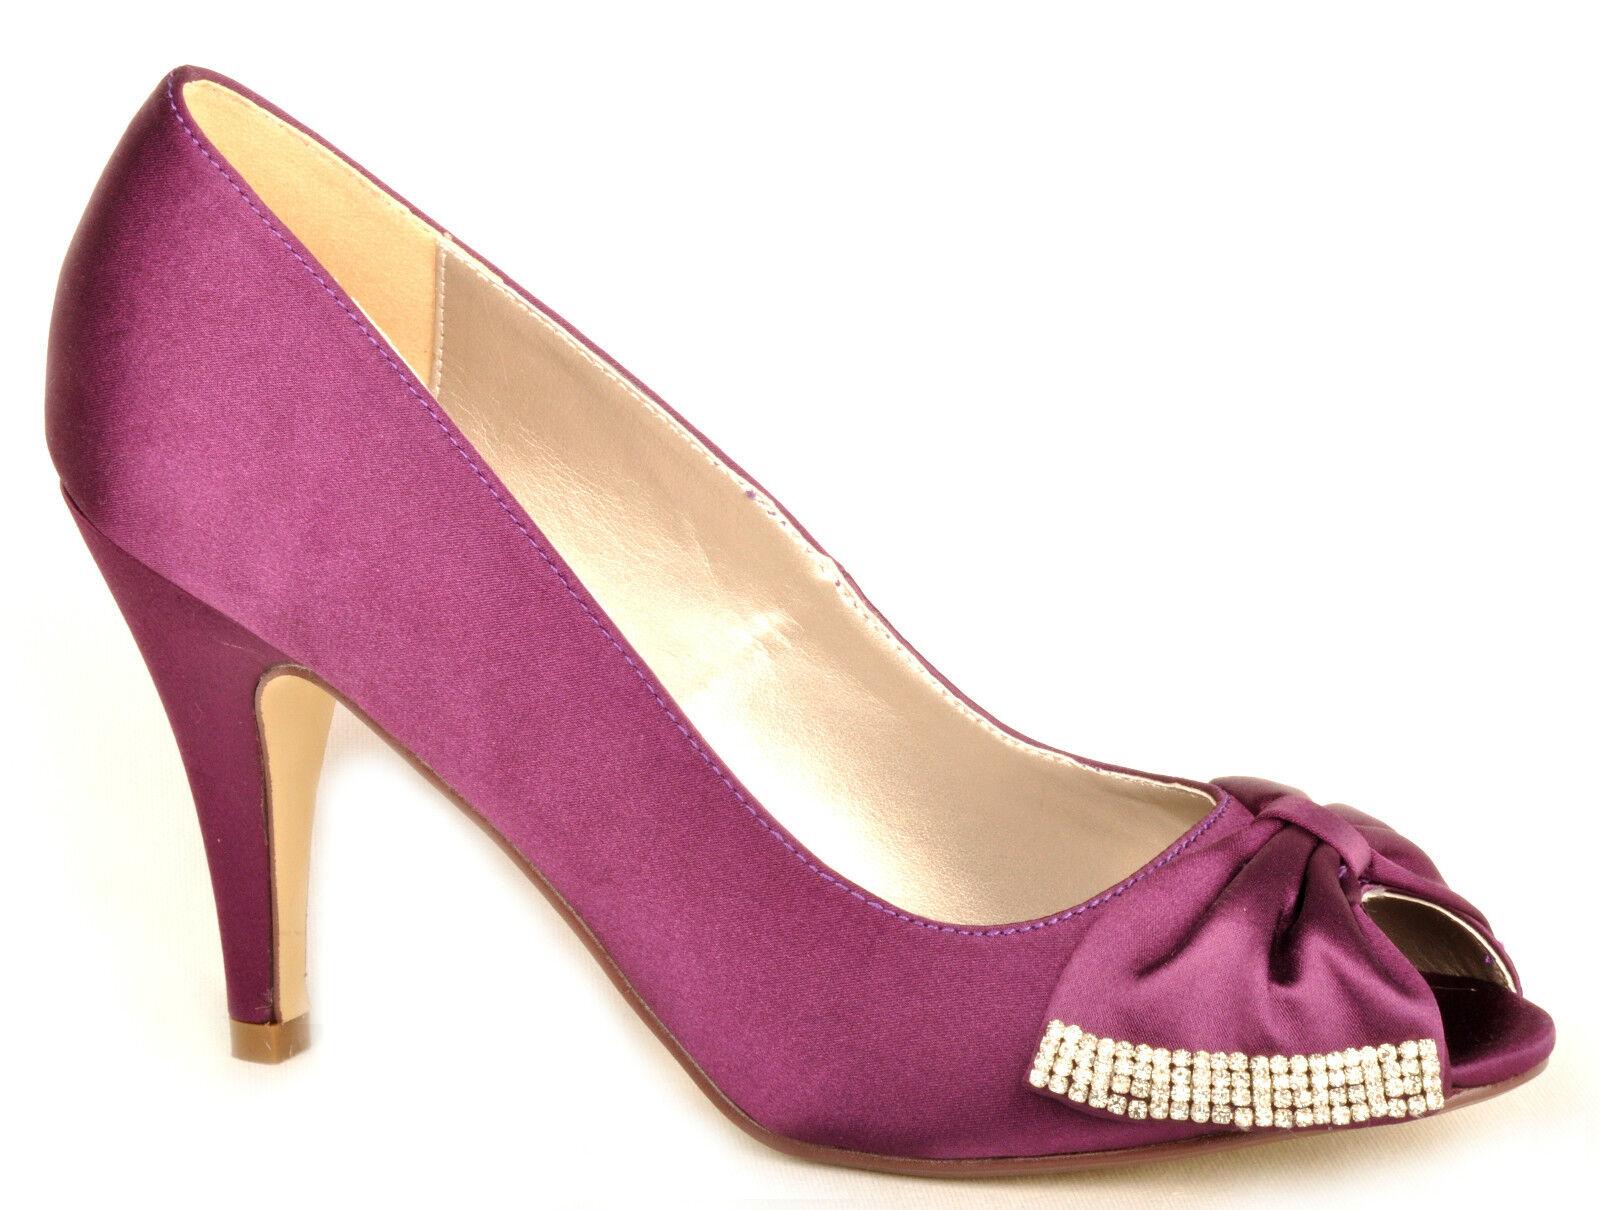 New Purple Satin Diamante High Heel Wedding Bridal Prom Shoes UK 3 4 5 6 7 7.5